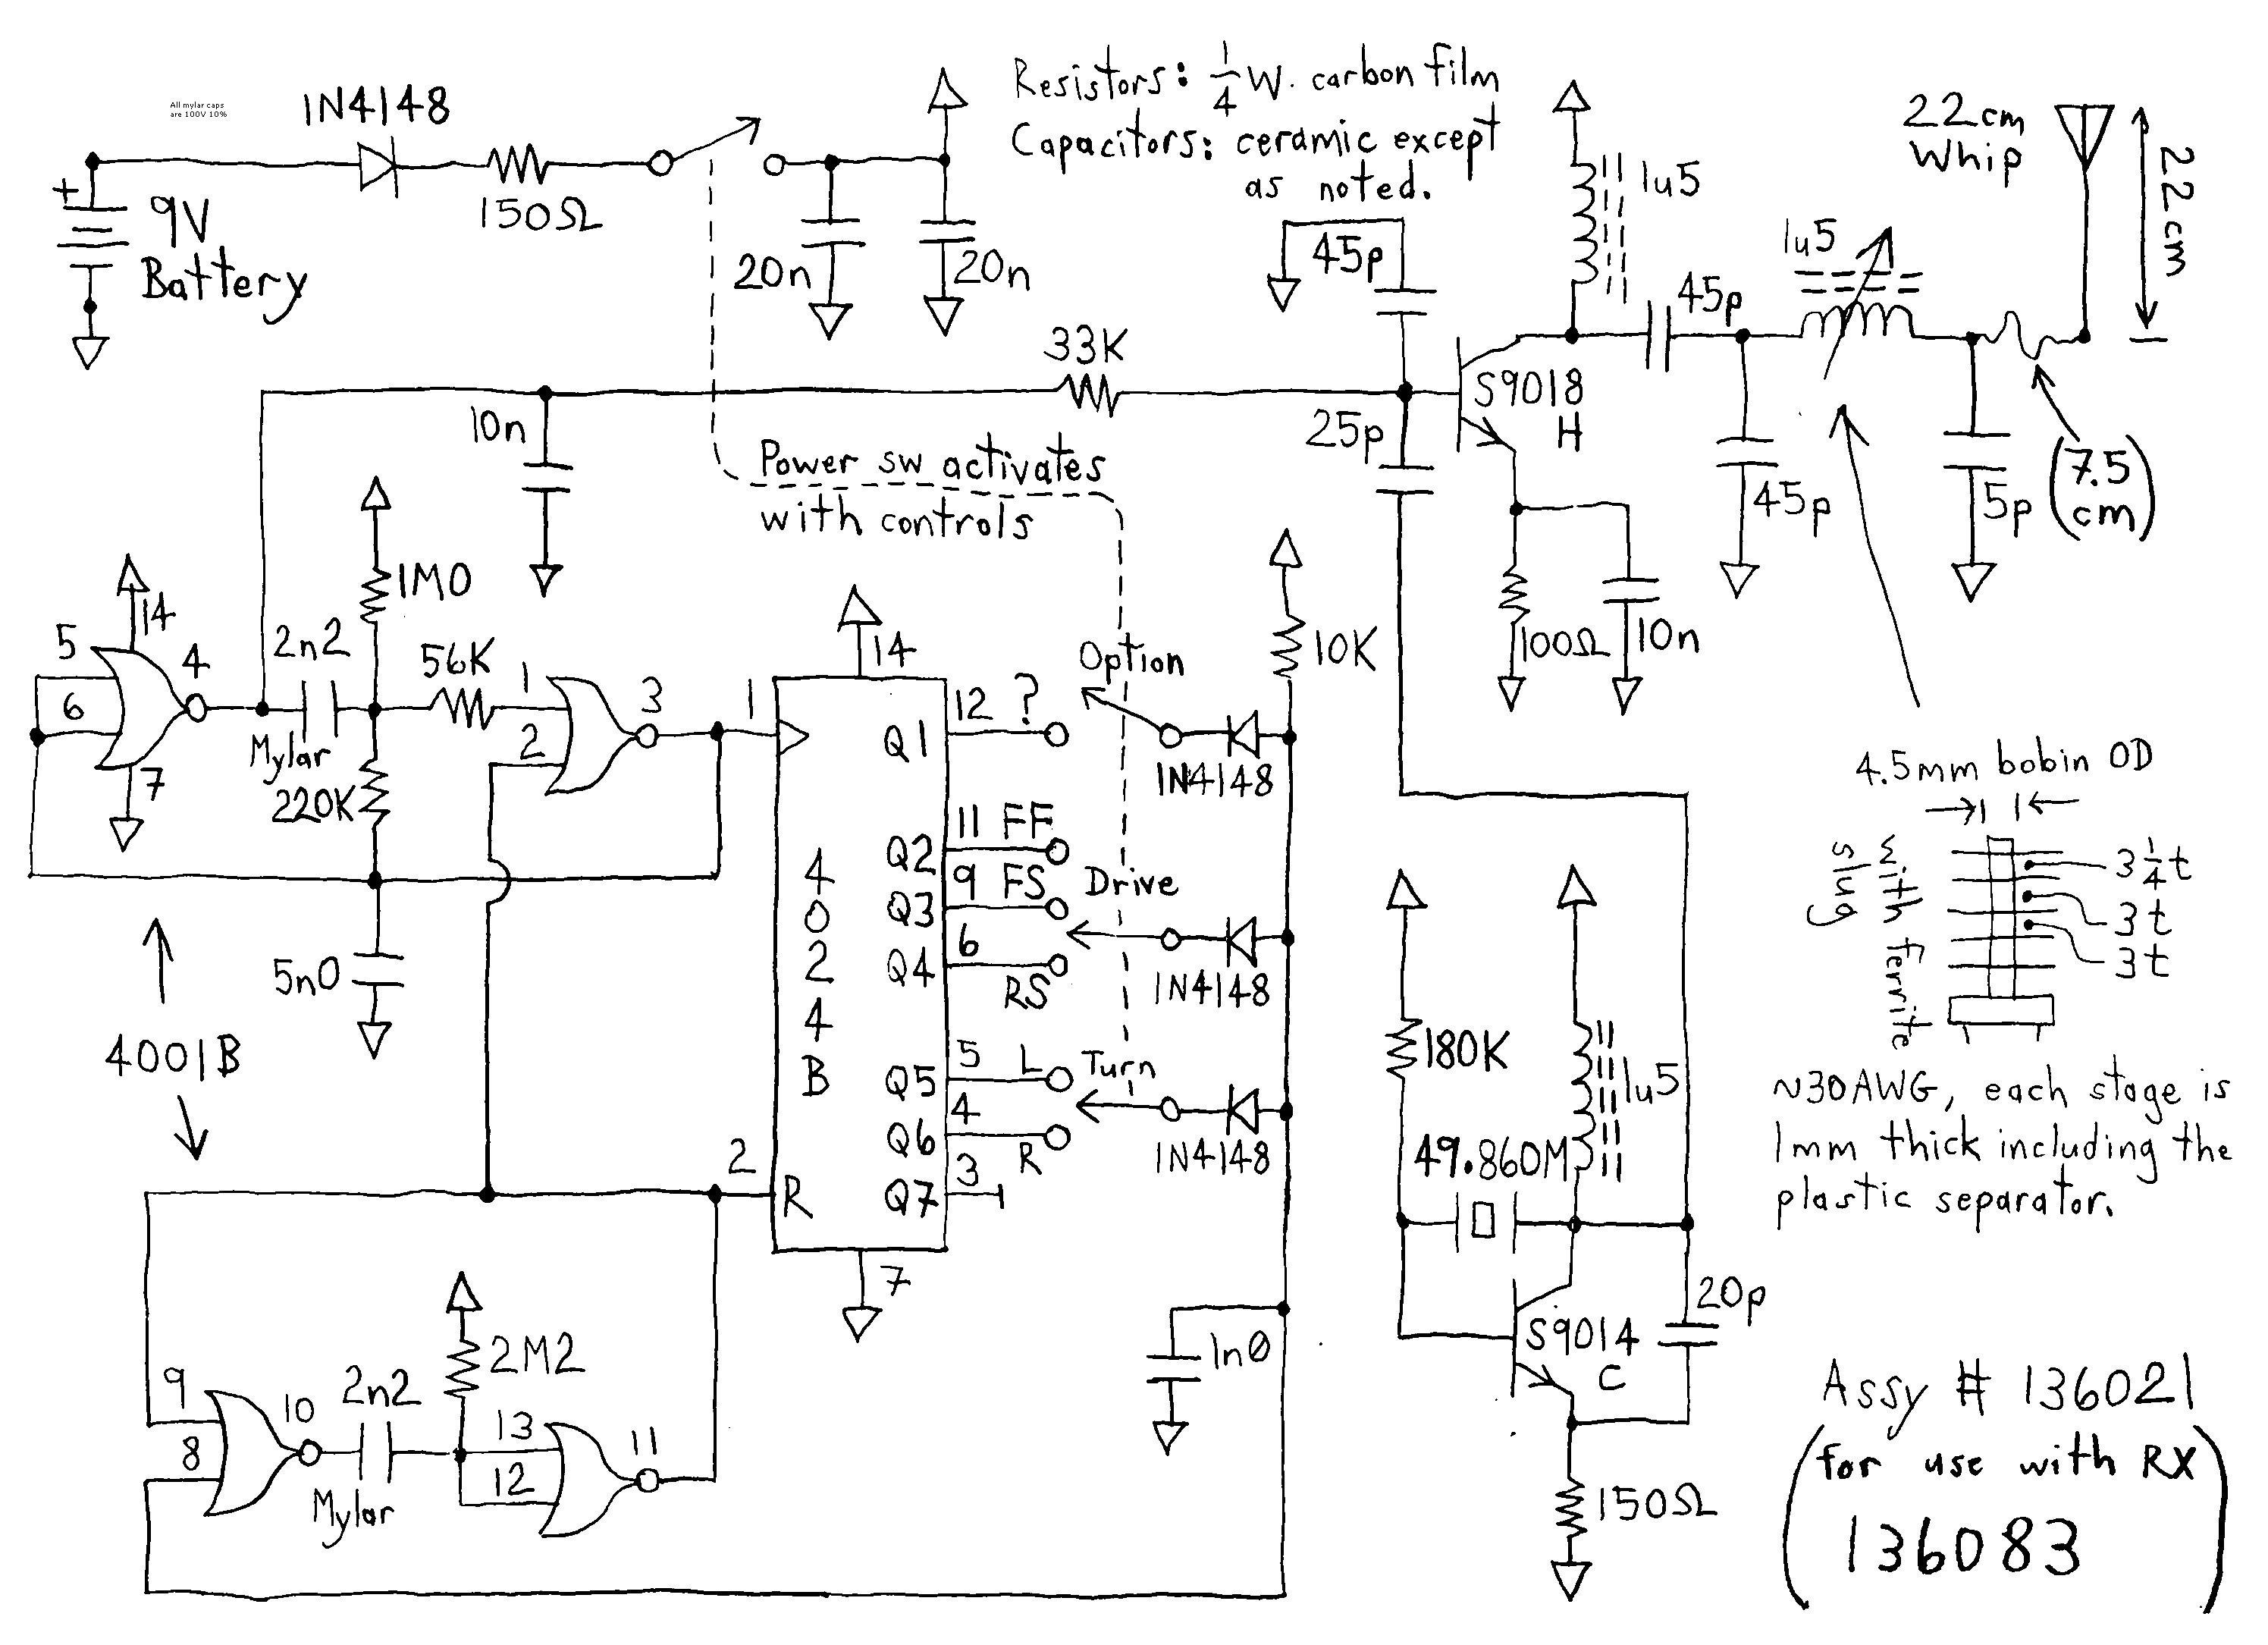 Air Fuel Ratio Gauge Wiring Diagram Valid Auto Meter Wiring Diagram Valid Wiring Diagram for Auto